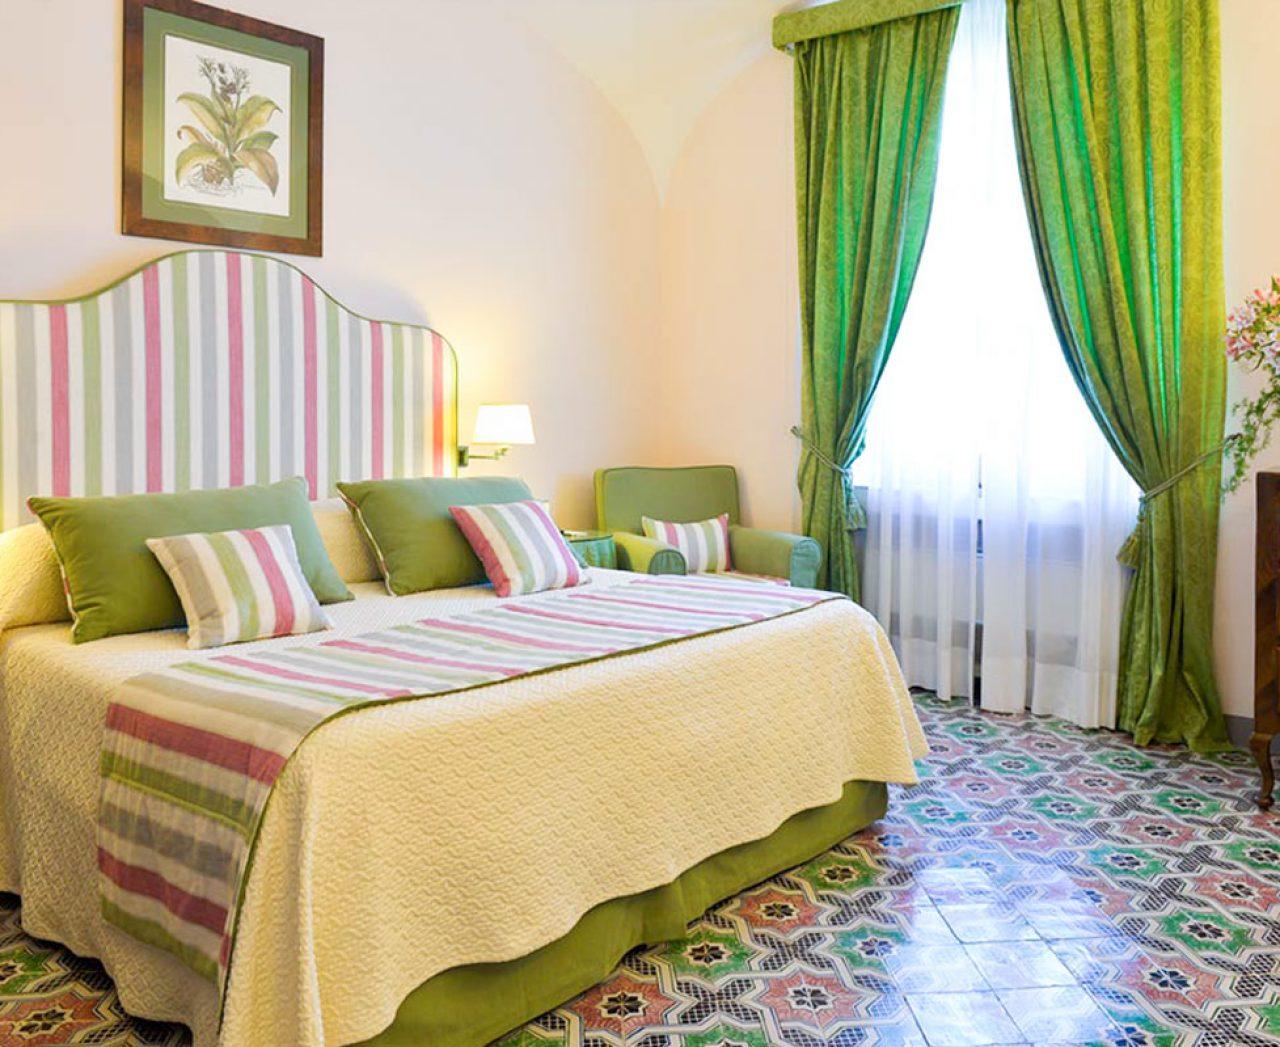 Hotel Villa Cimbrone - Rooms Deluxe